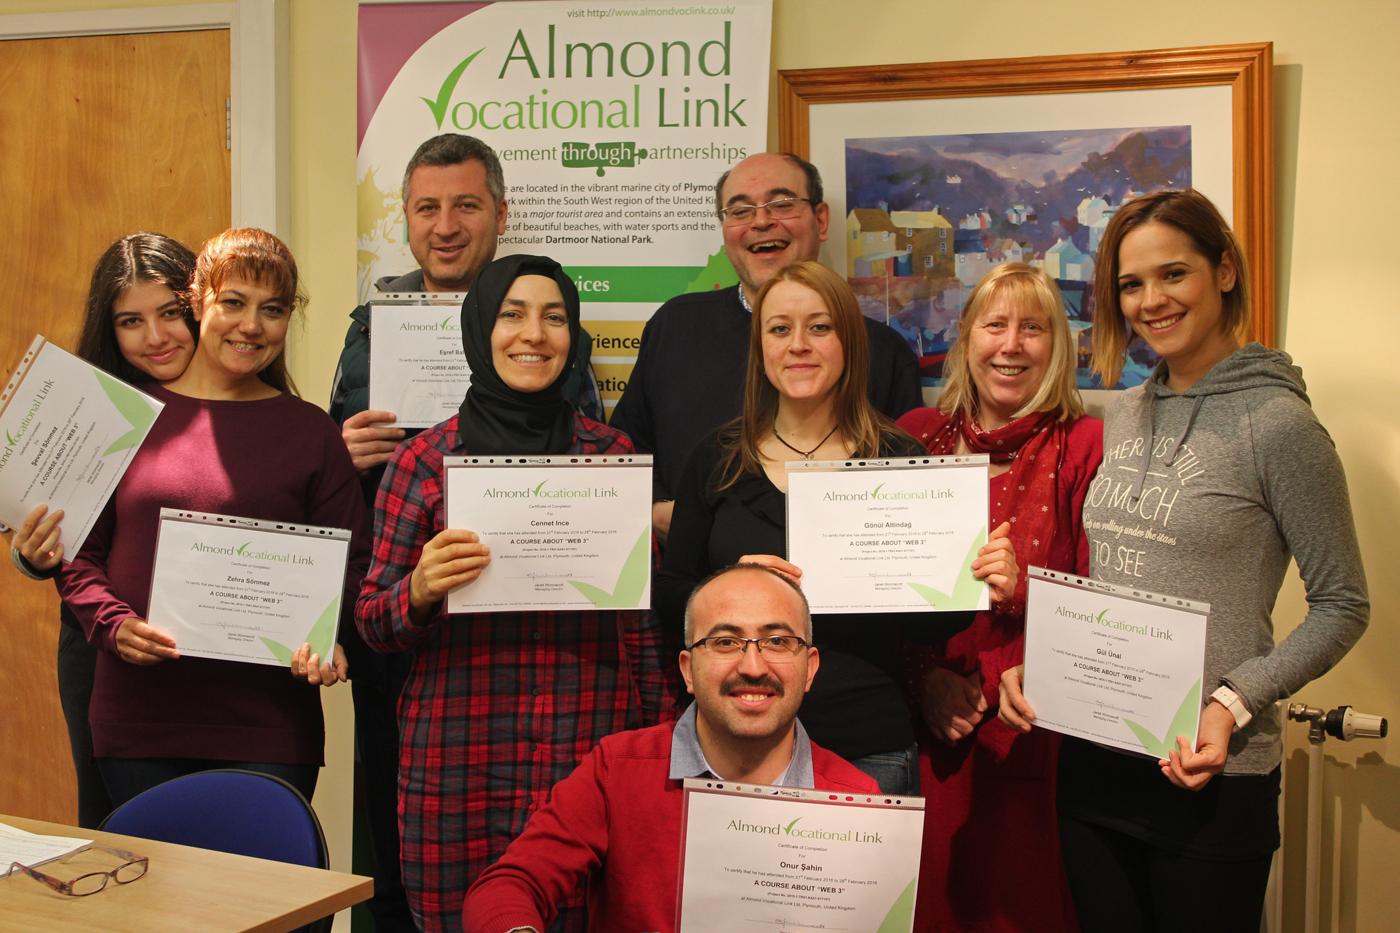 Certificate Ceremony Almond Vocational Link Erasmus Plus KA1 Teacher Training WEB 3